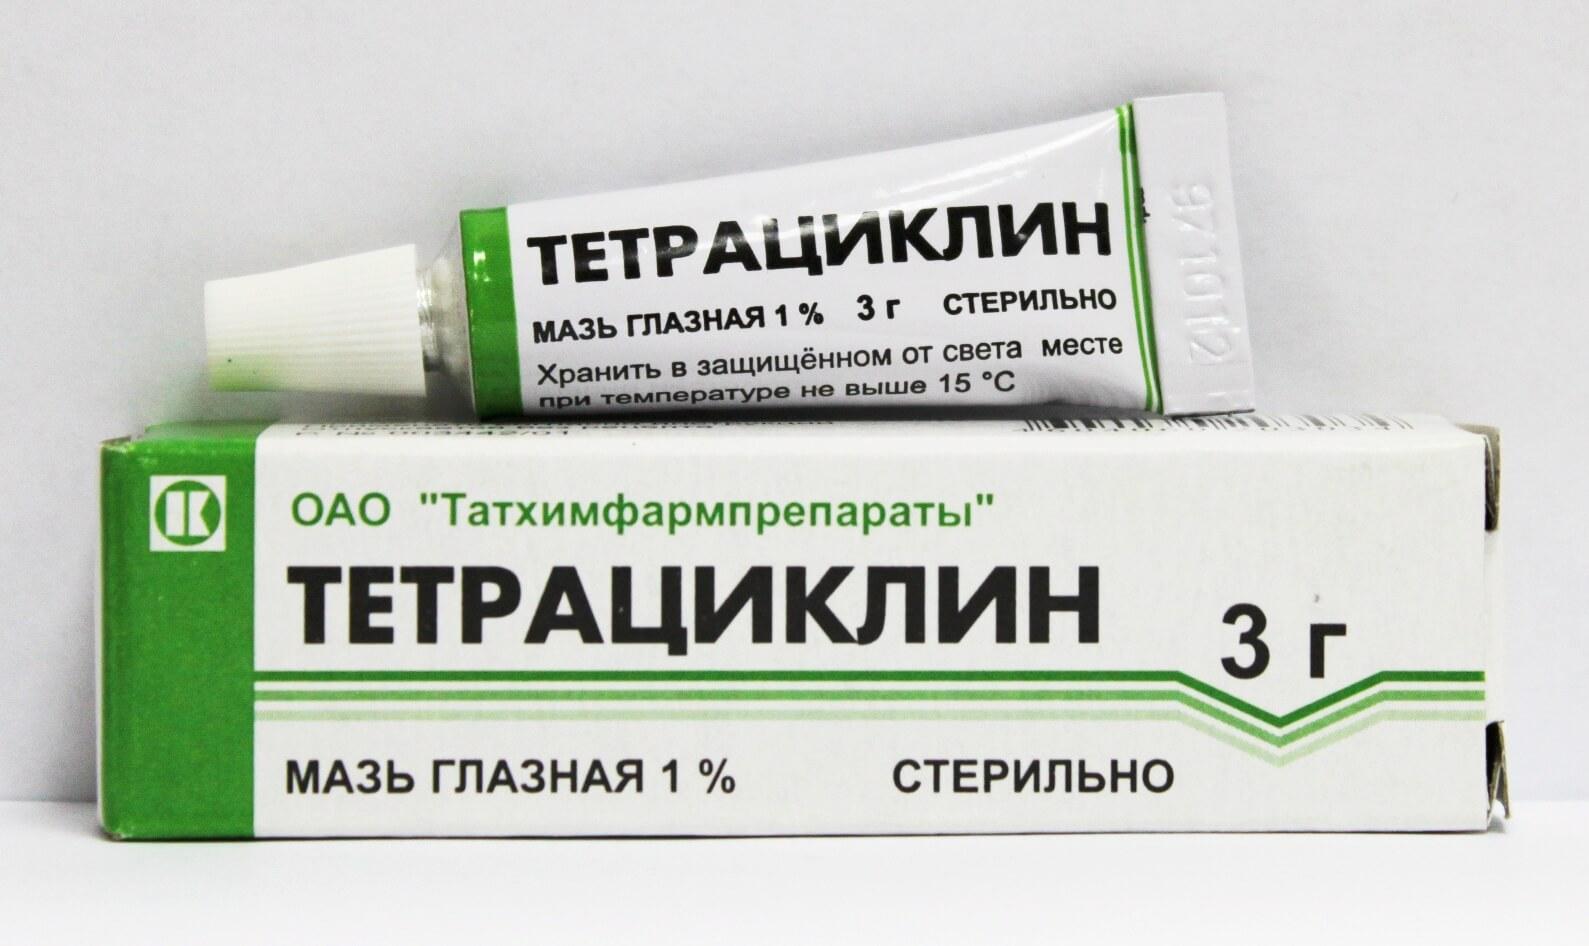 tetracikl nova ochna maz v n s 1 - тетрациклінова Очна мазь в ніс